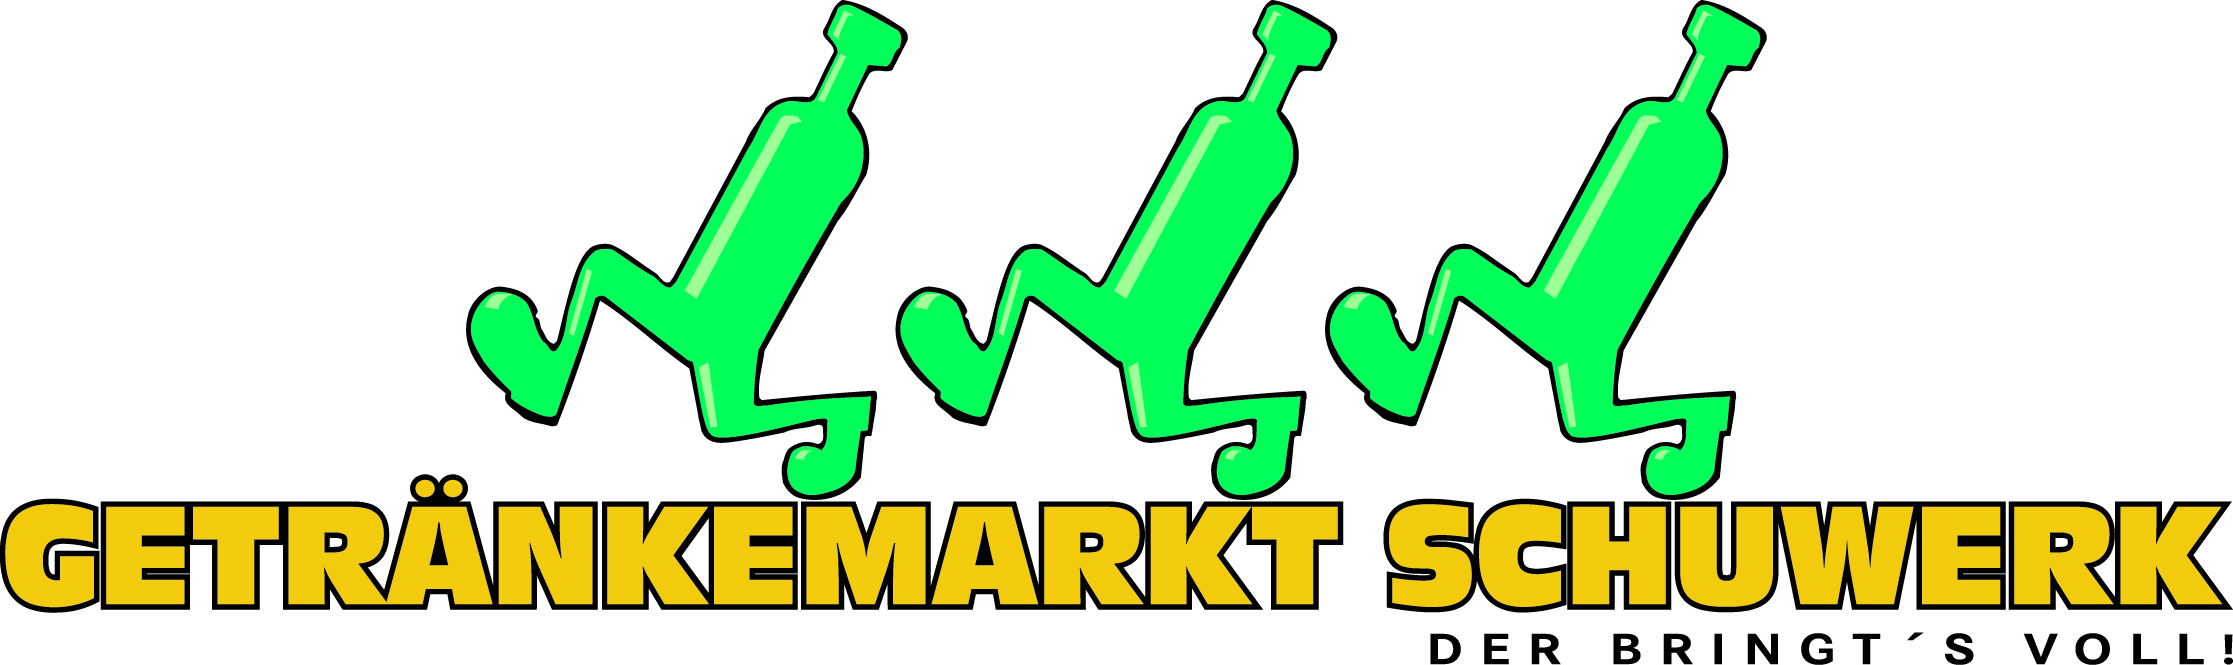 schuwerk_getraenkemarkt